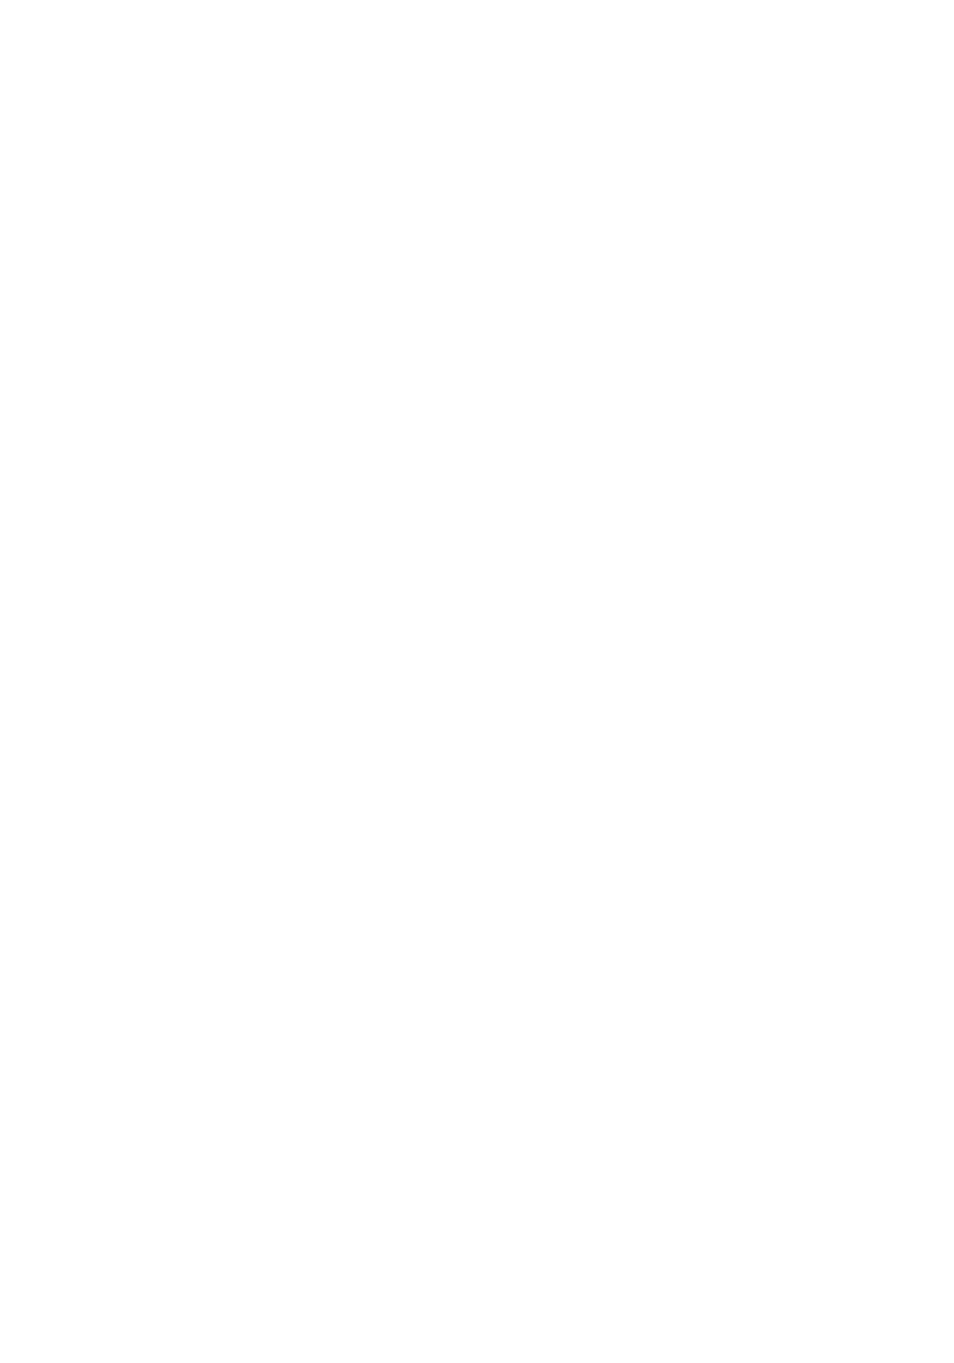 motorola minitor v user manual page 10 17 rh manualsdir com Motorola Minitor V User Manual Motorola Minitor Case